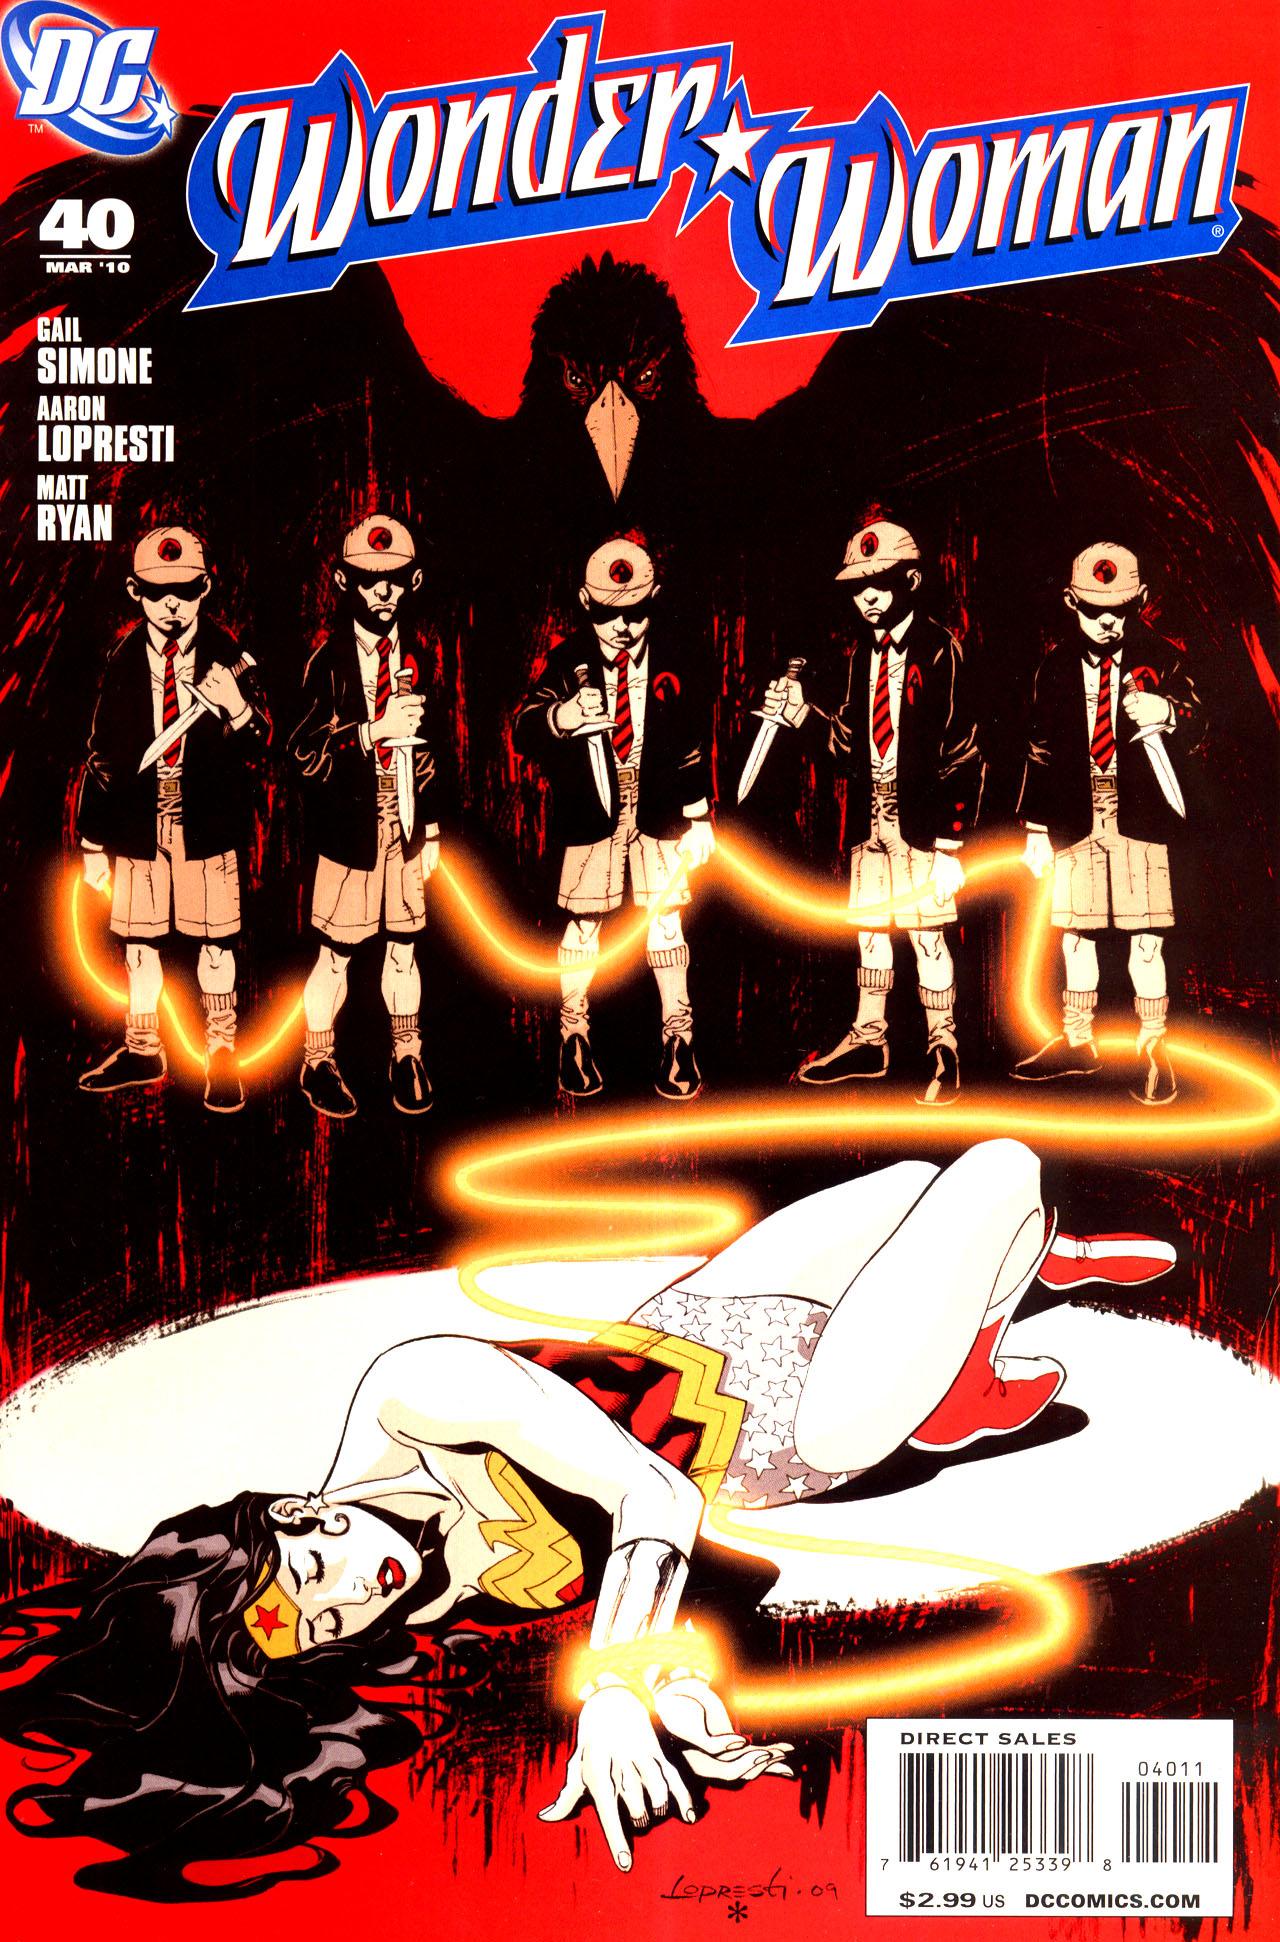 Read online Wonder Woman (2006) comic -  Issue #40 - 1